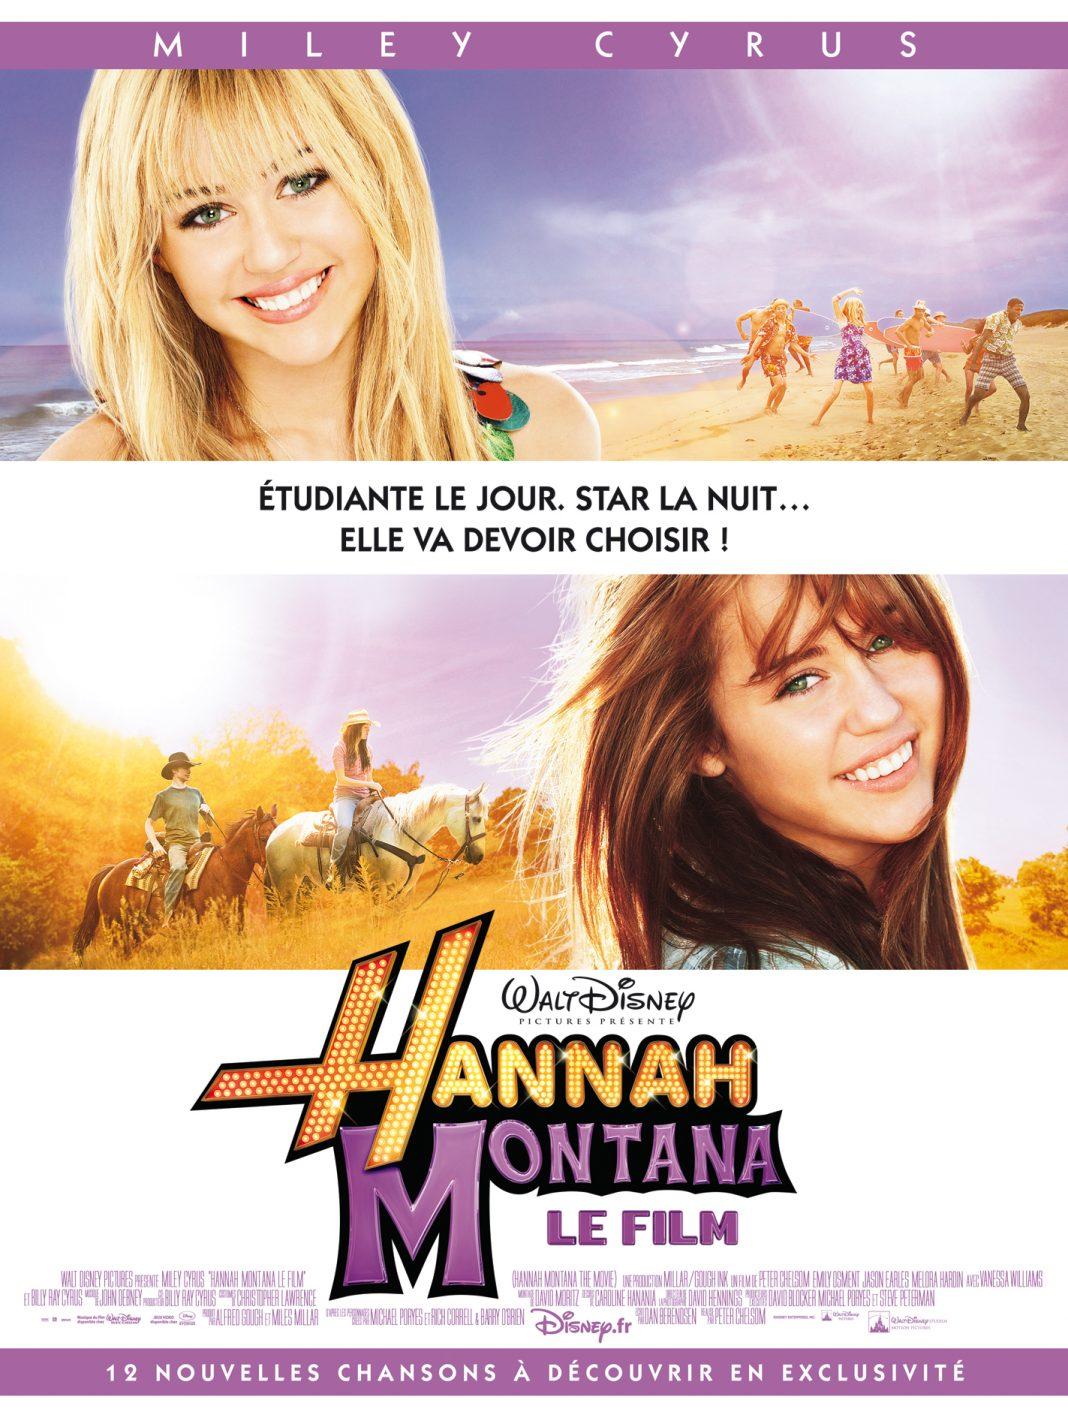 walt disney company walt disney pictures affiche hannah montana film poster movie